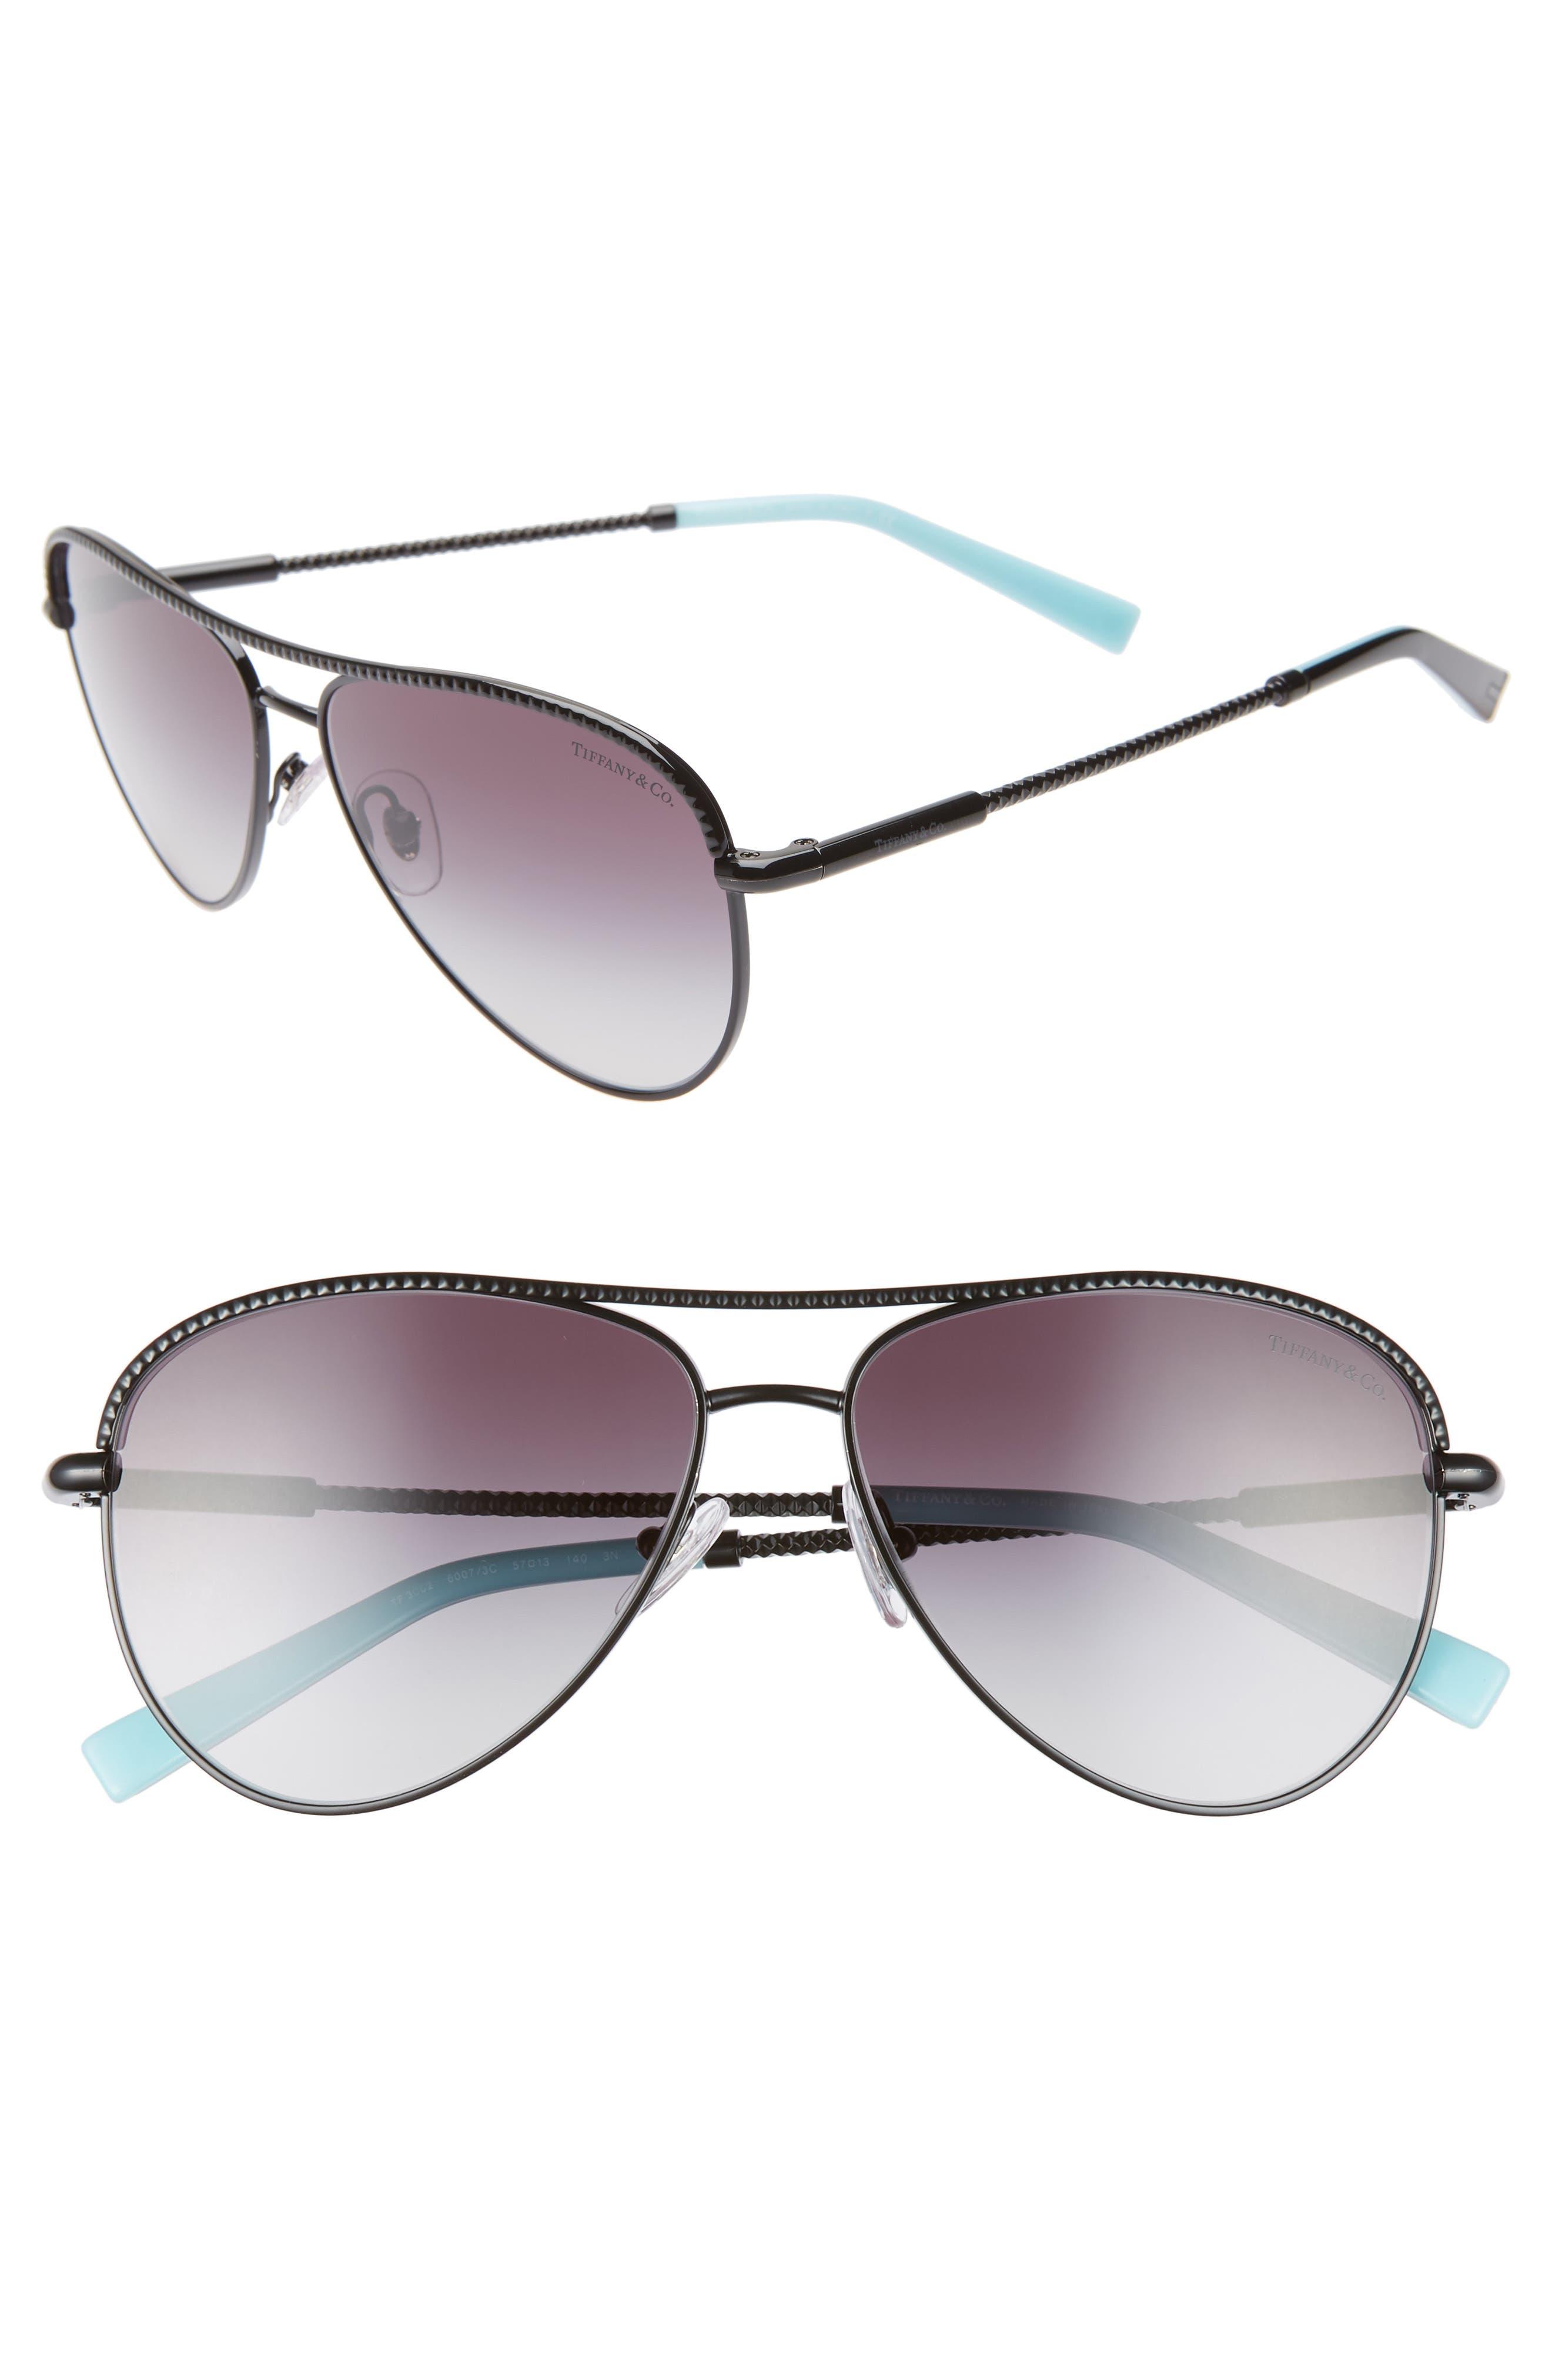 f4dc6ed1723 Women s Tiffany   Co 57Mm Aviator Sunglasses - Black Gradient